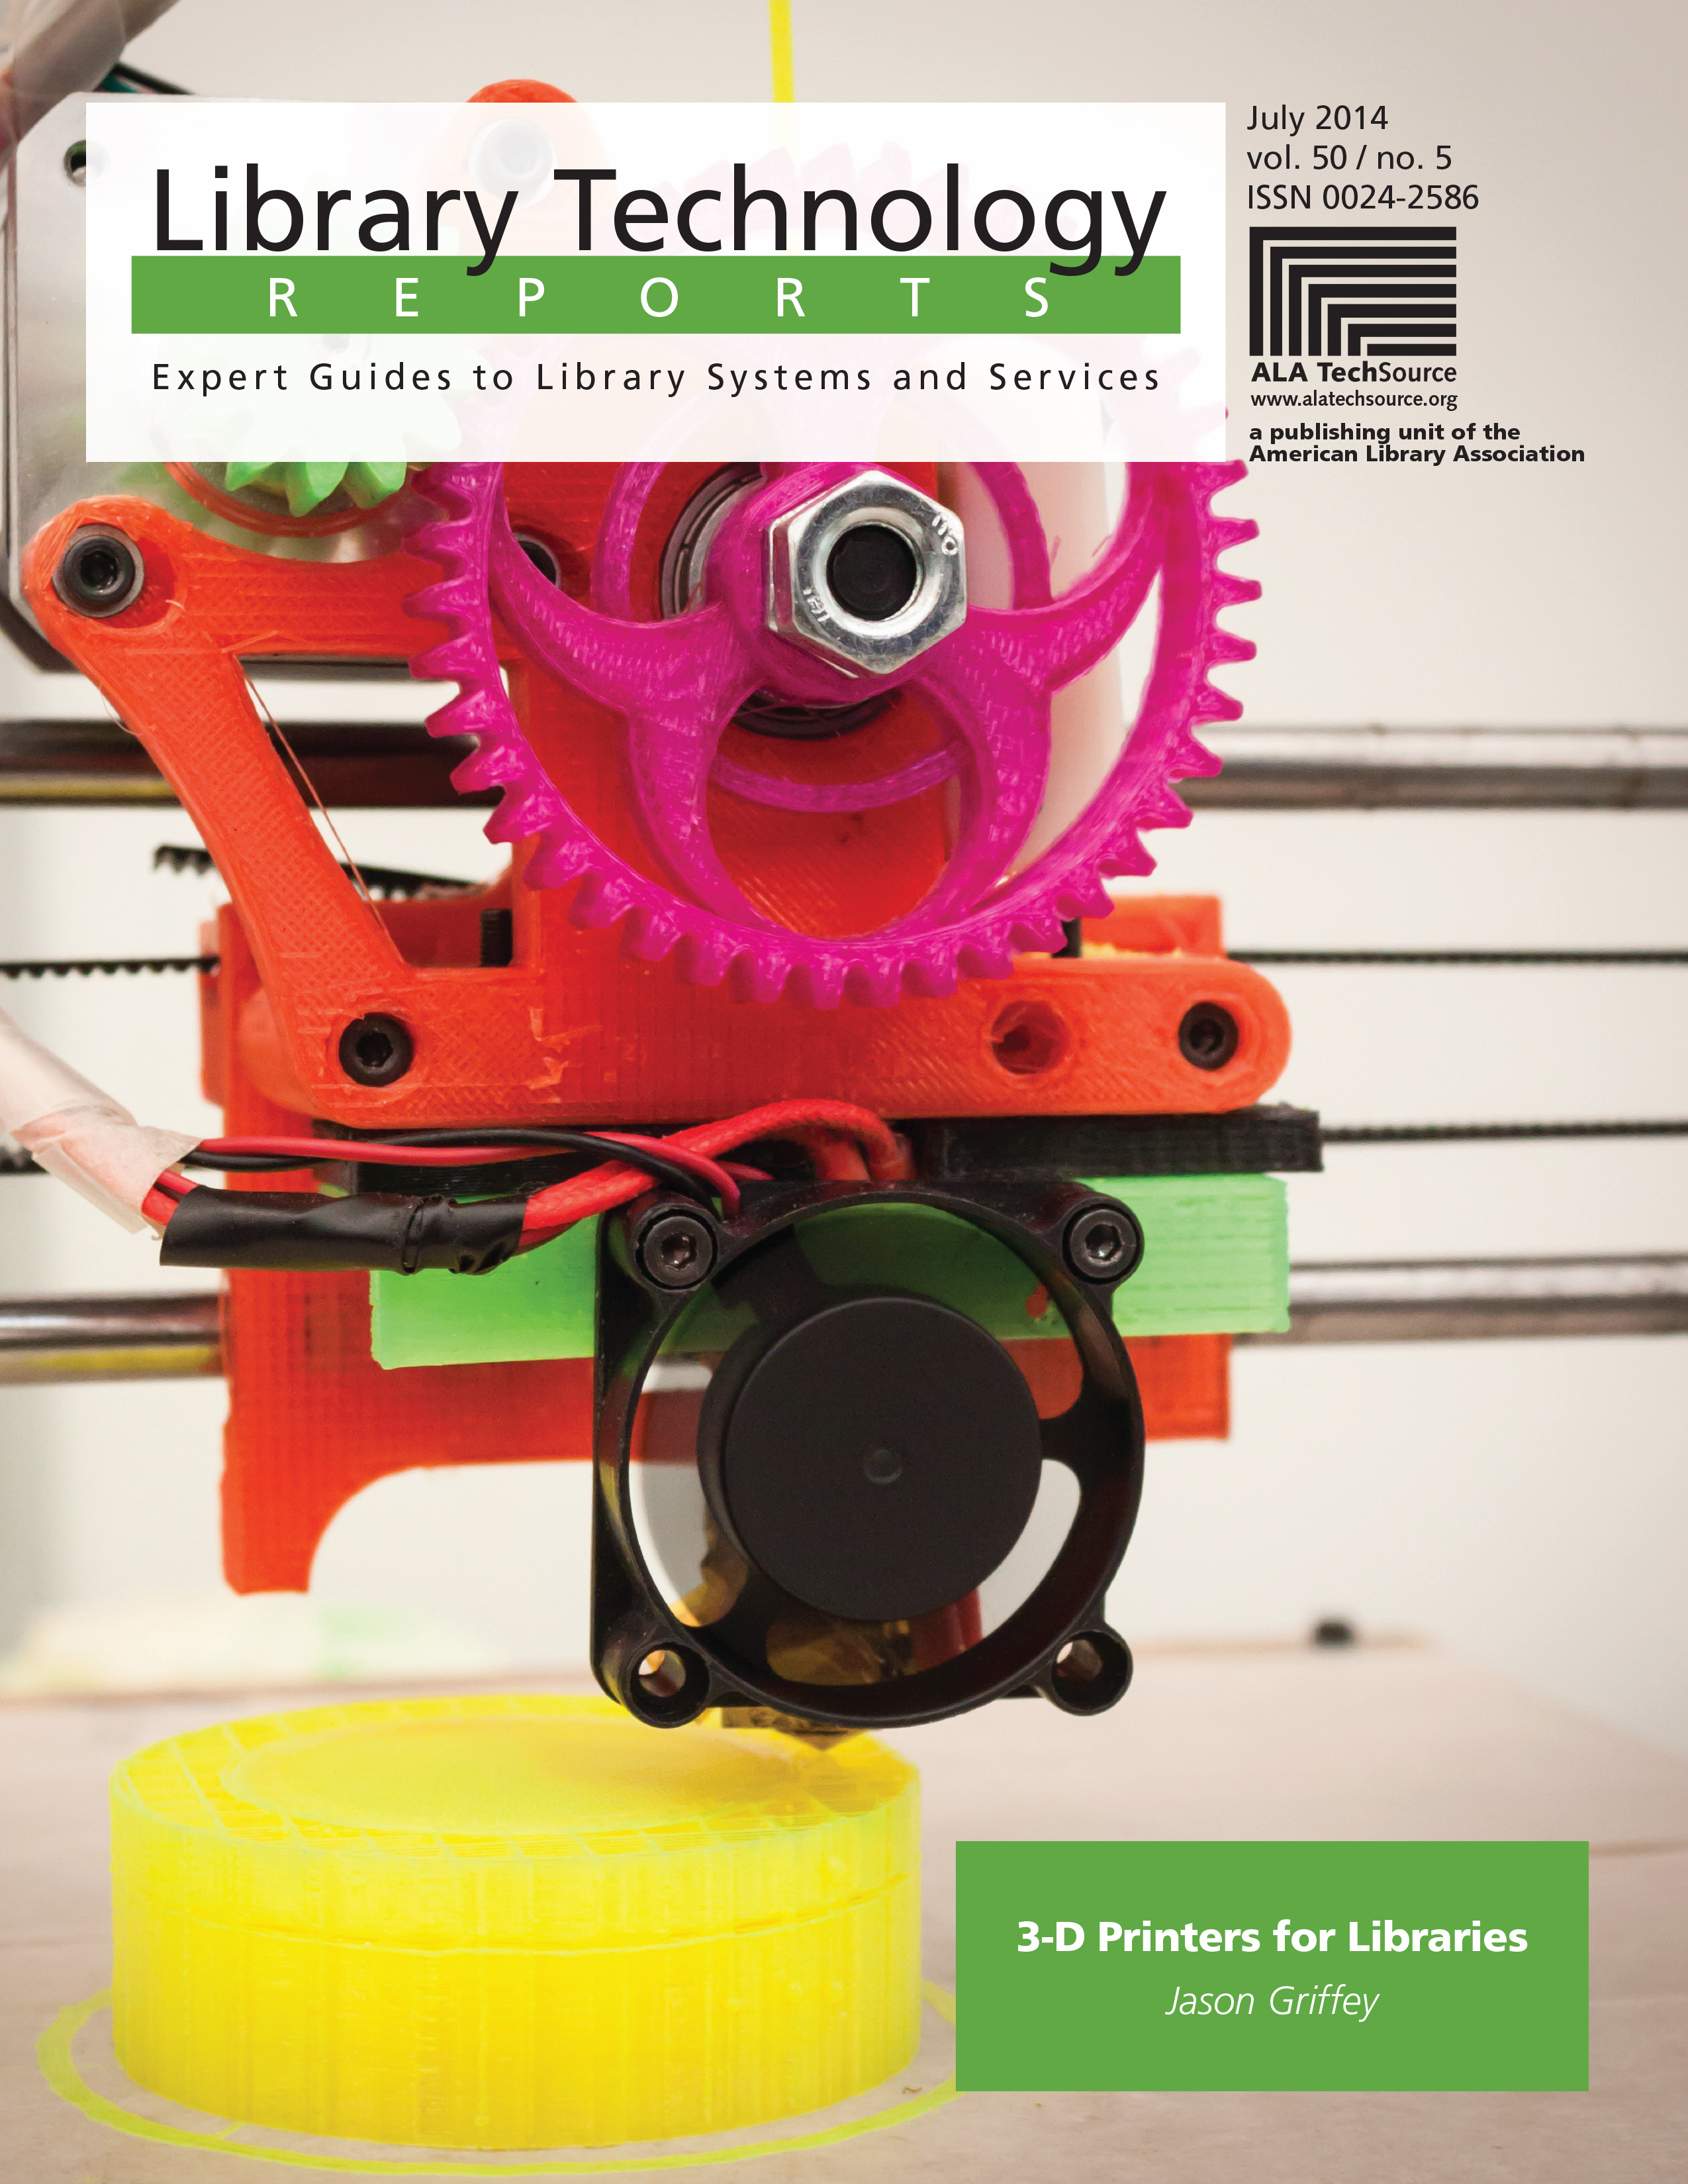 3D Printers for Libraries - 7661628973f27d3 , 3D-Printers-for-Libraries-13660345 , 3D Printers for Libraries , Array , 13660345 , Language Arts & Disciplines , 96370721